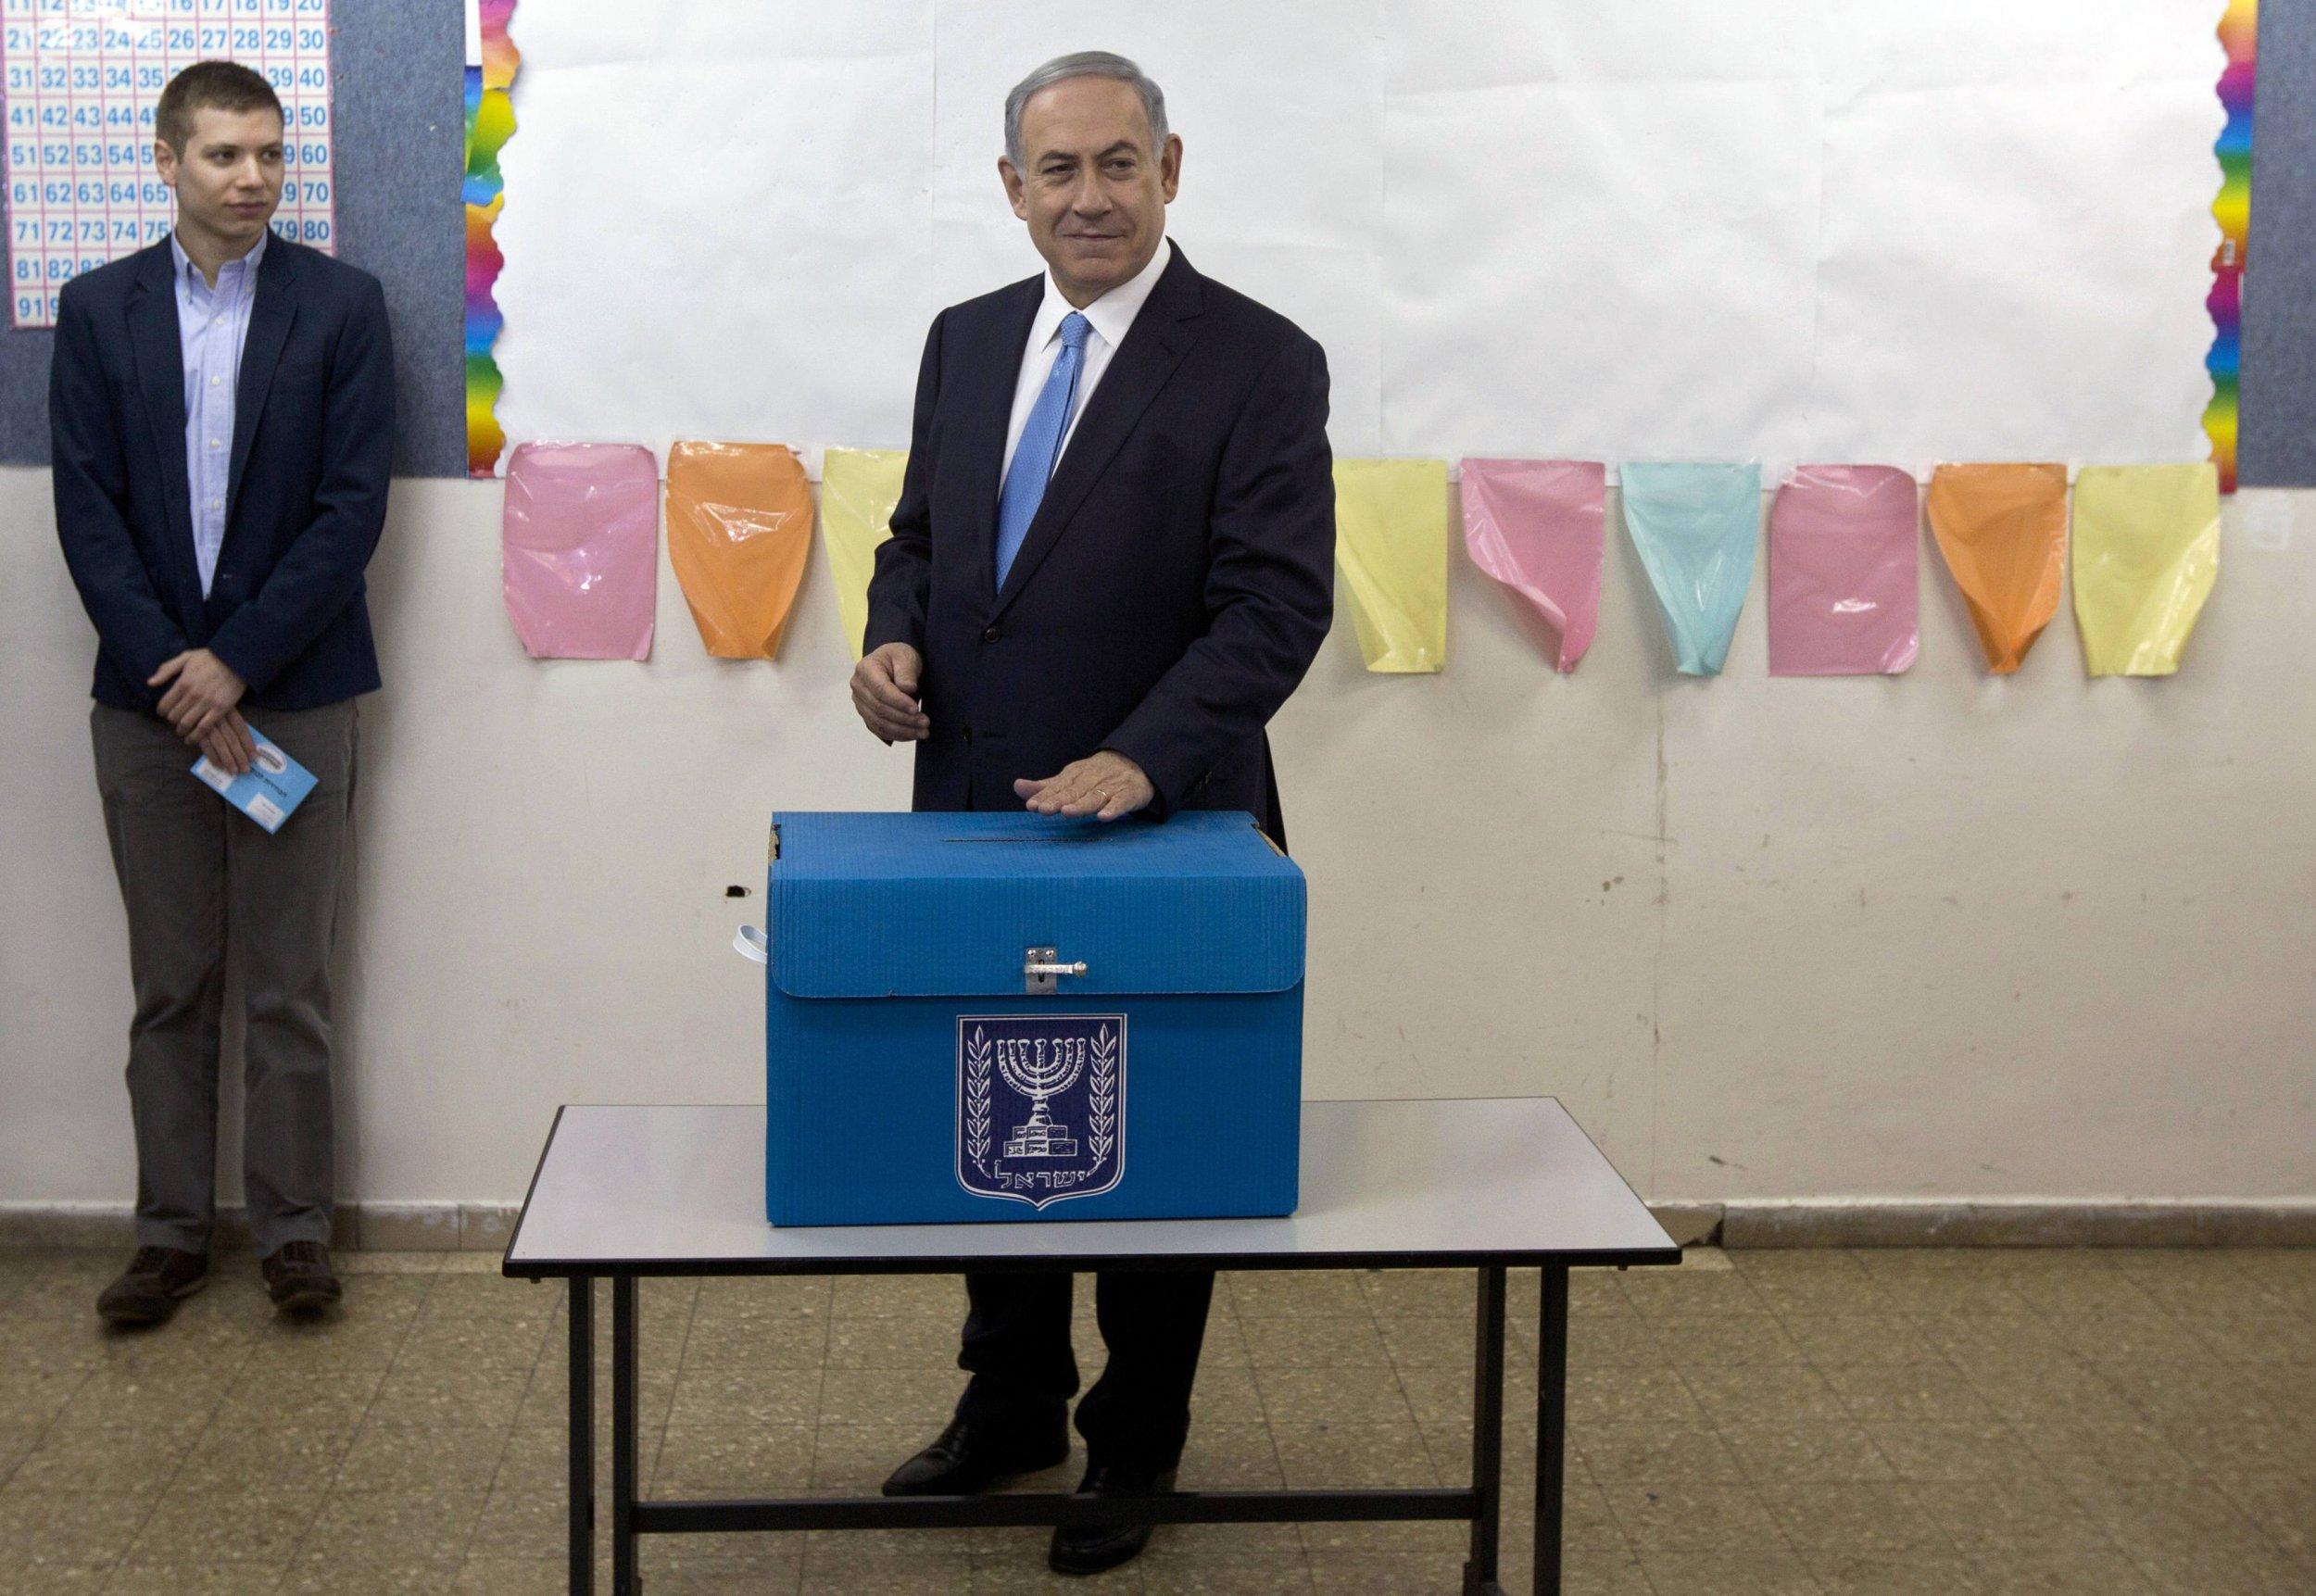 2015-03-17T200004Z_1582725454_GM1EB3I0B1301_RTRMADP_3_ISRAEL-ELECTION